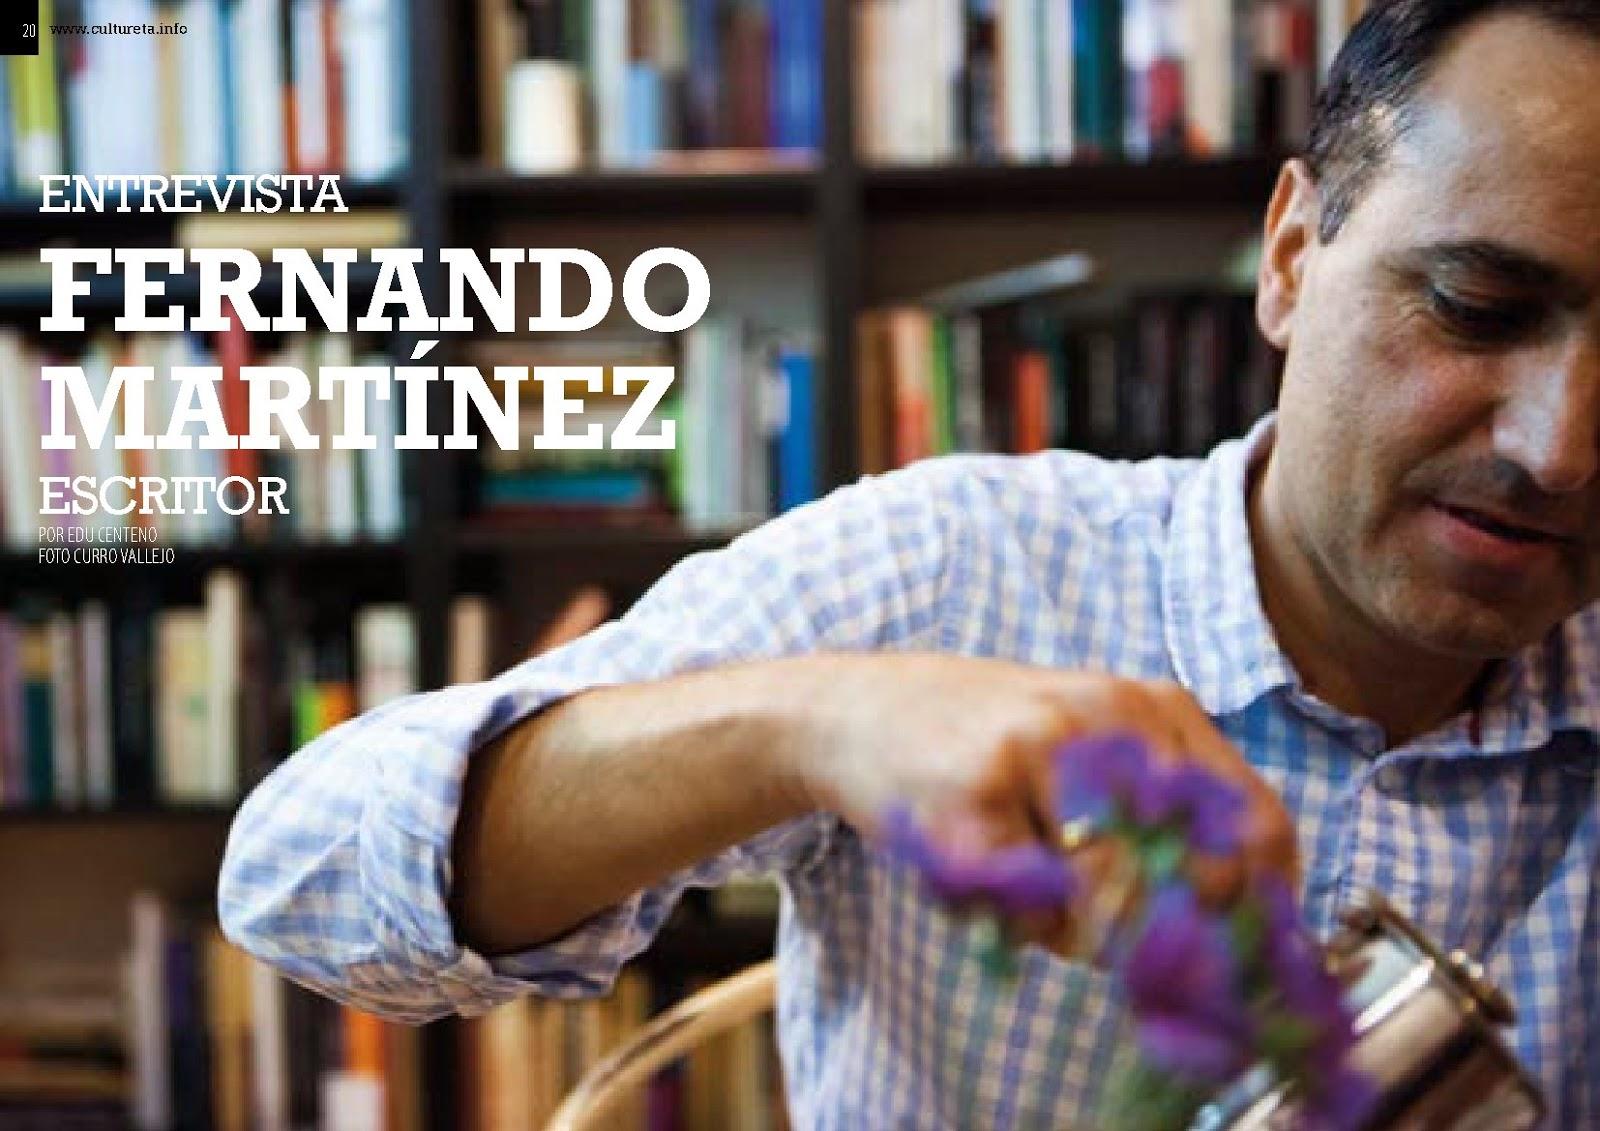 FERNANDO MARTÍNEZ: Entrevista